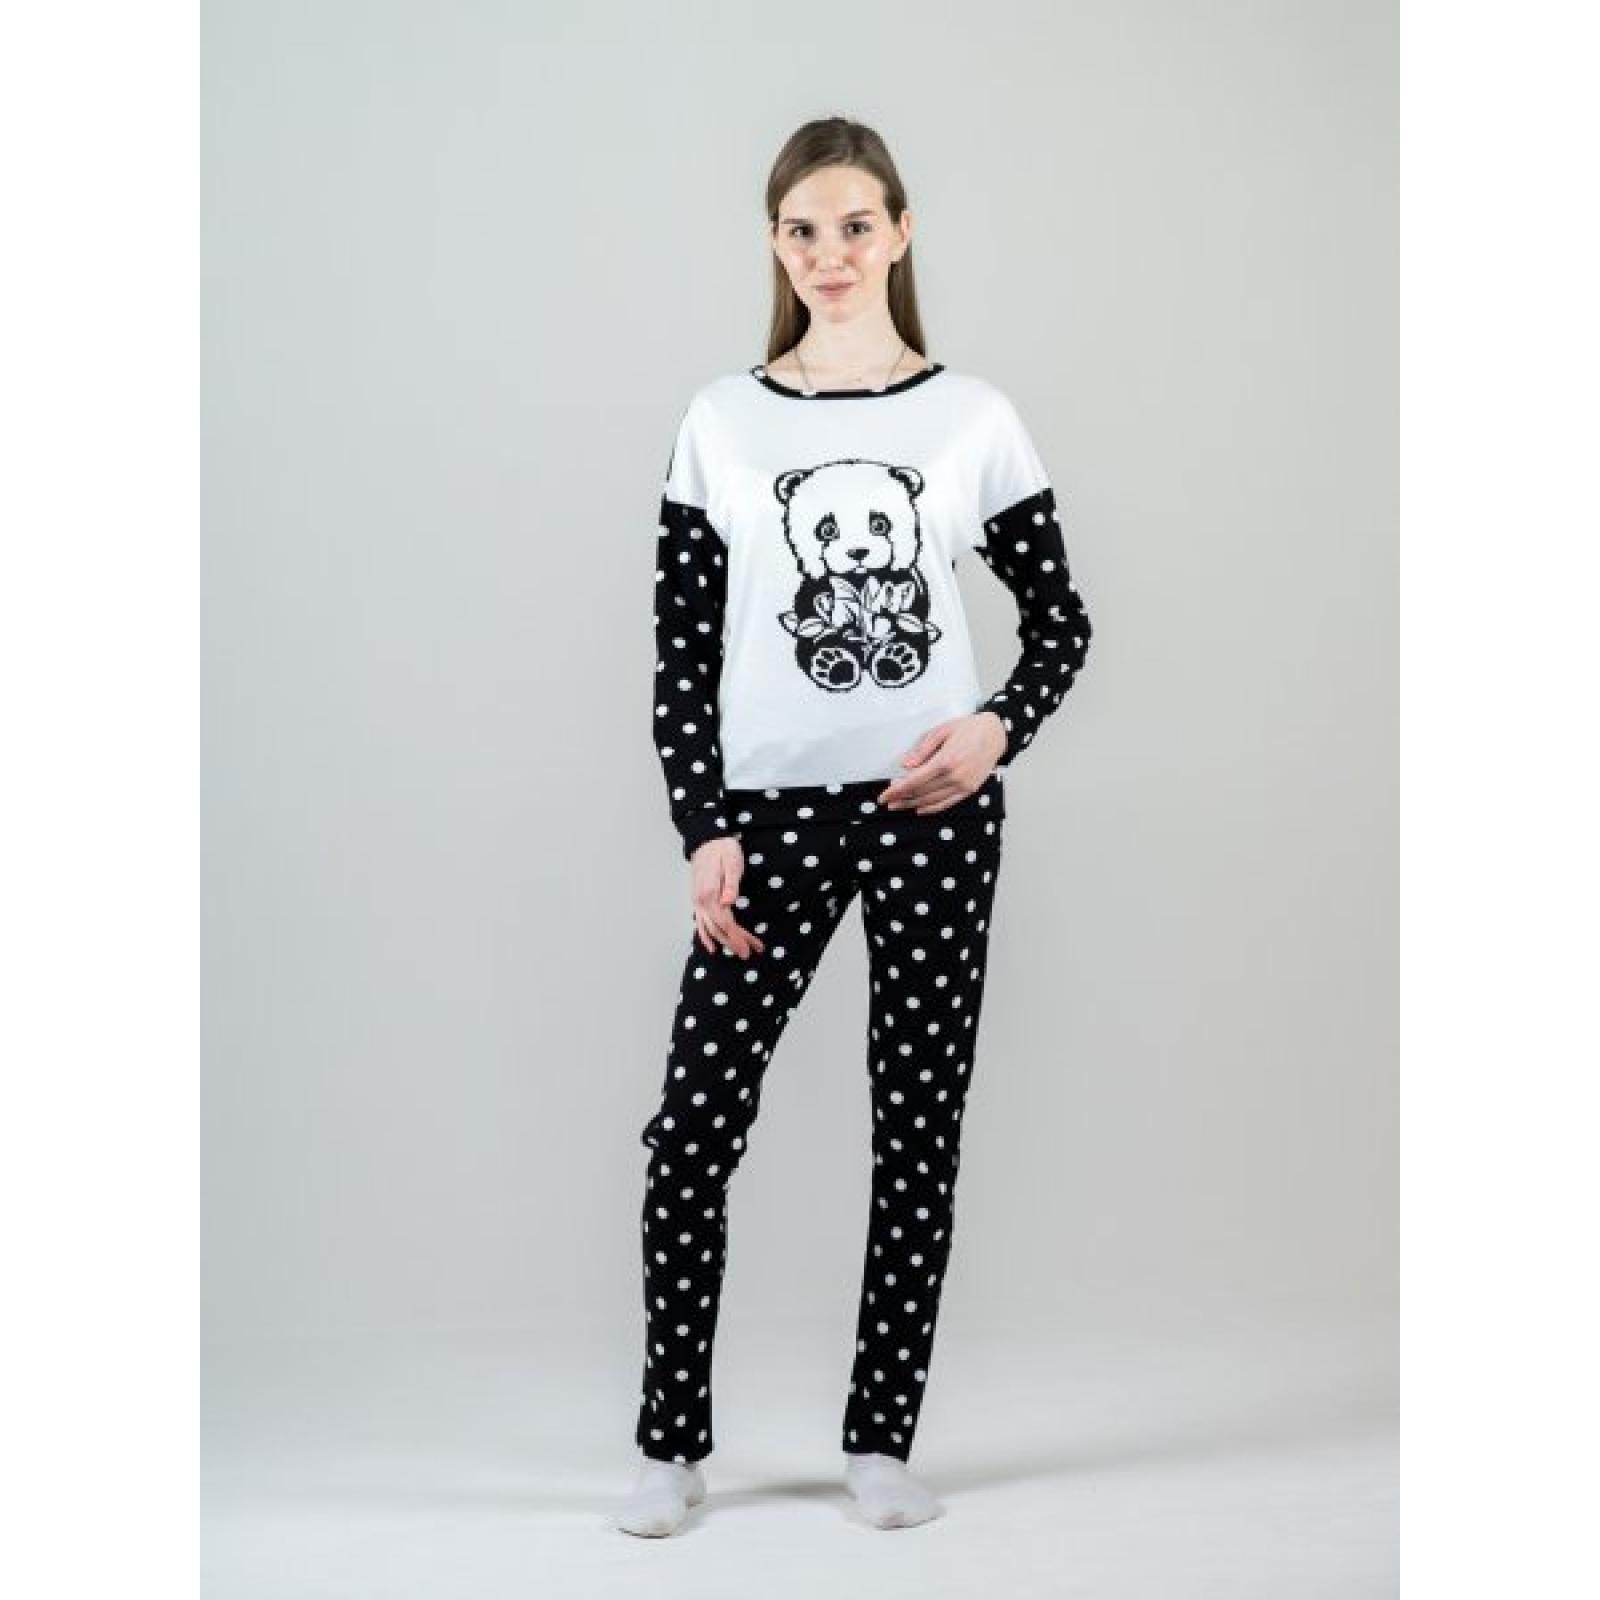 Костюм домашний Панда (чёрный, горох) М-0108